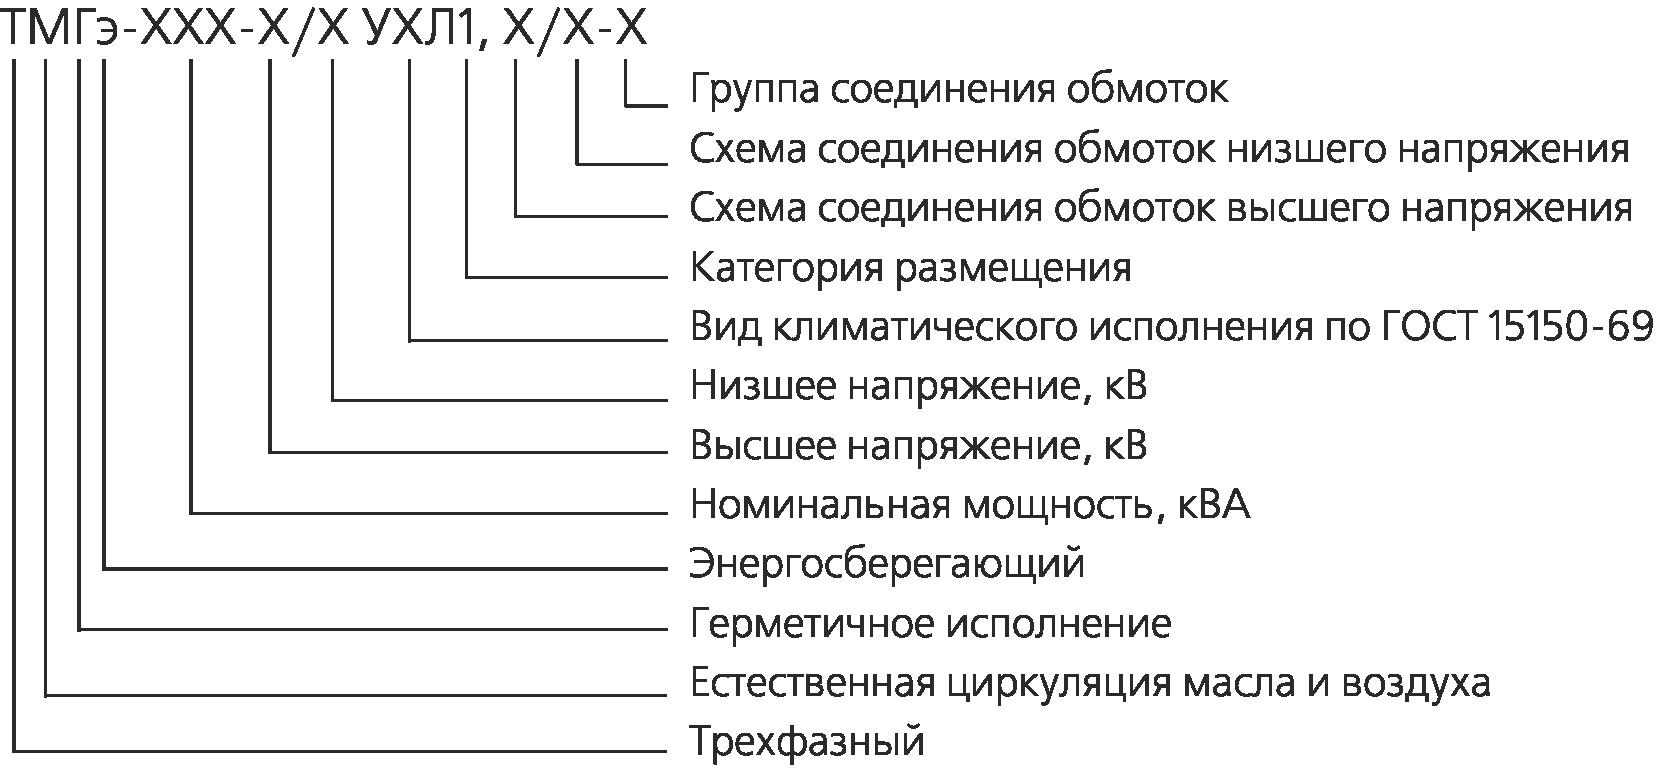 Трансформатор тмг-1250/20-у2